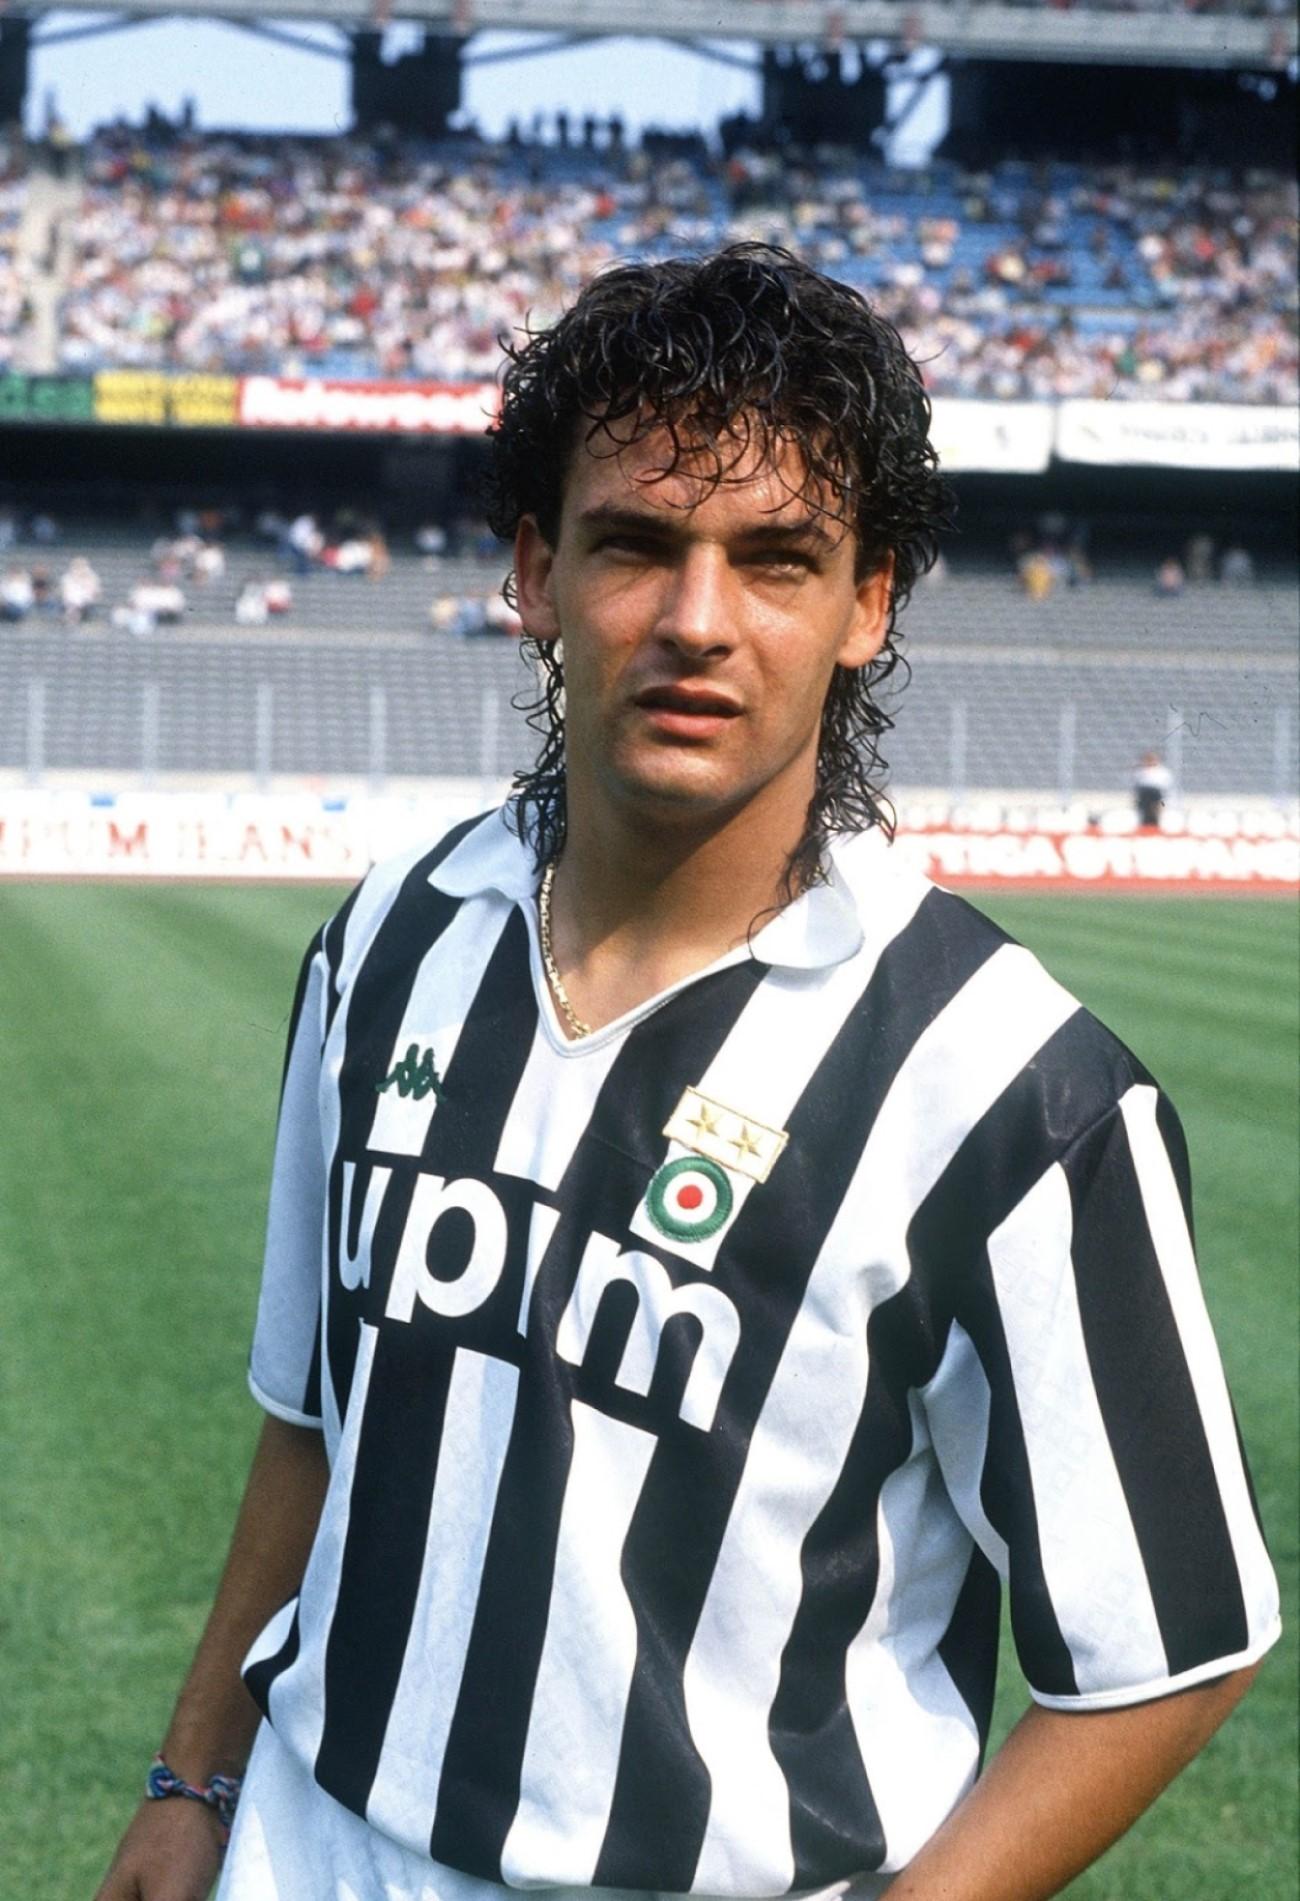 Roberto_Baggio_-_Juventus_Football_Club_1990-1991 (2)